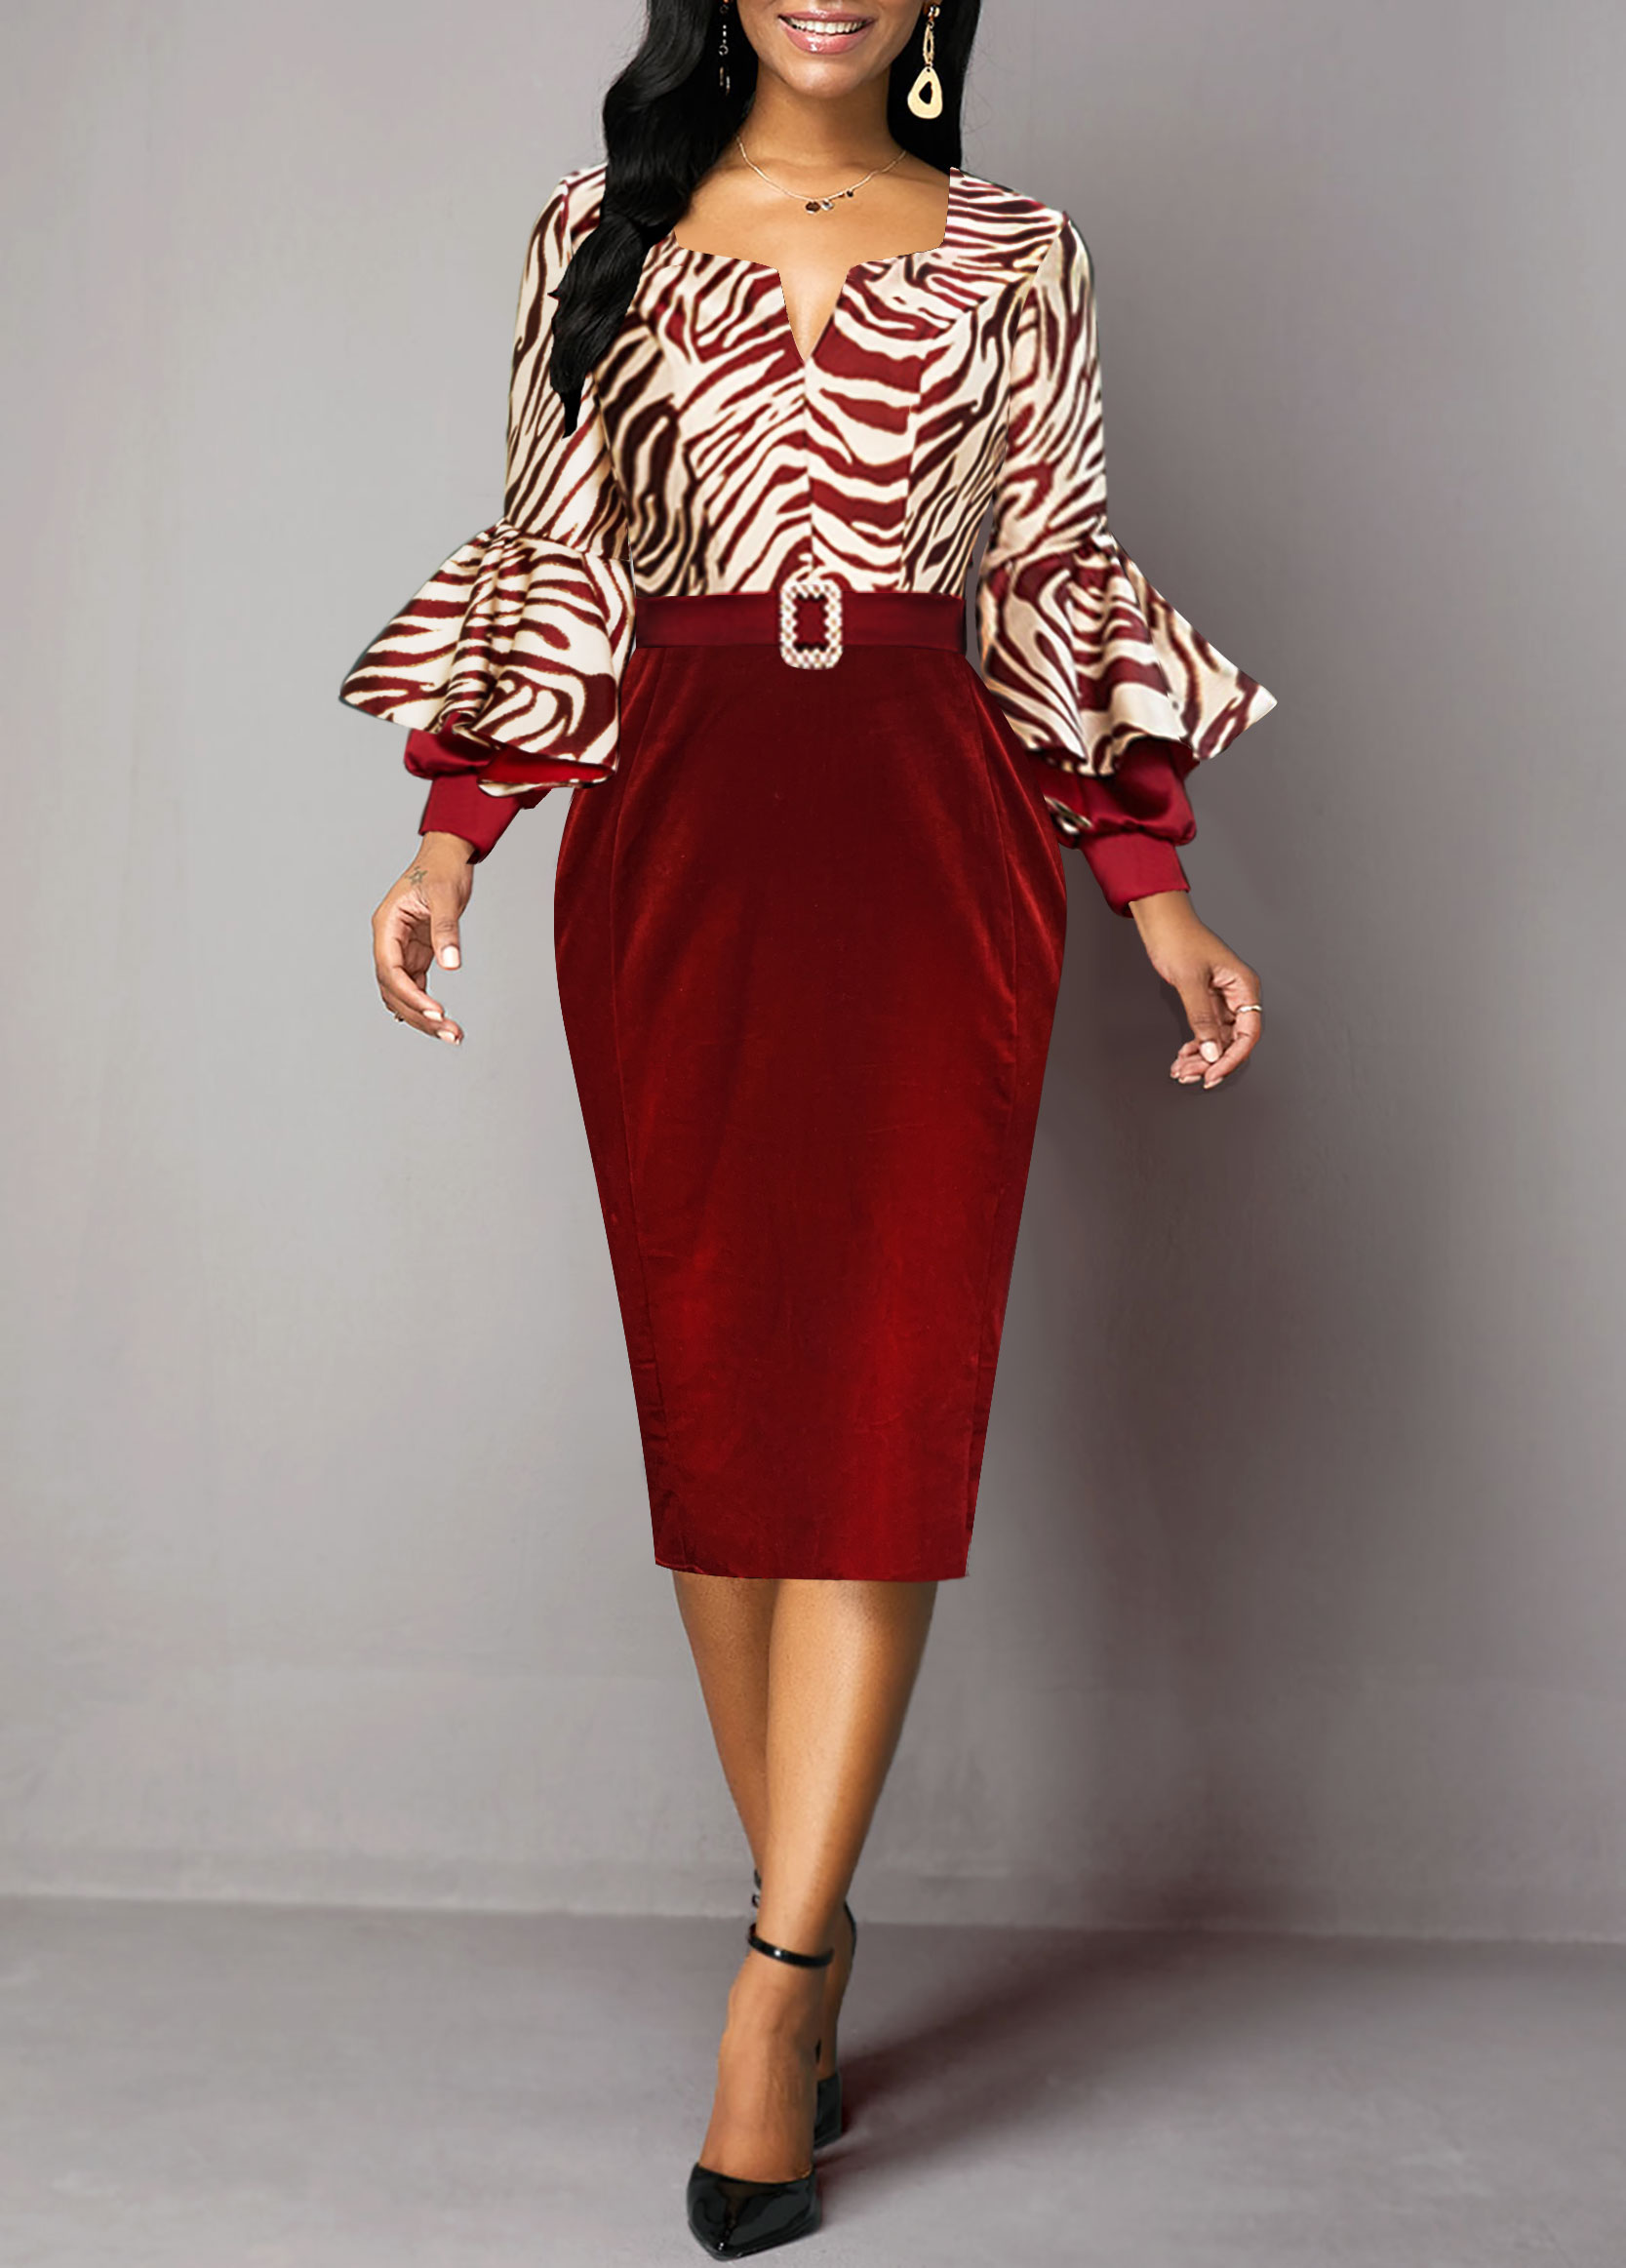 Zebra Print Long Sleeve Buckle Belted Sheath Dress